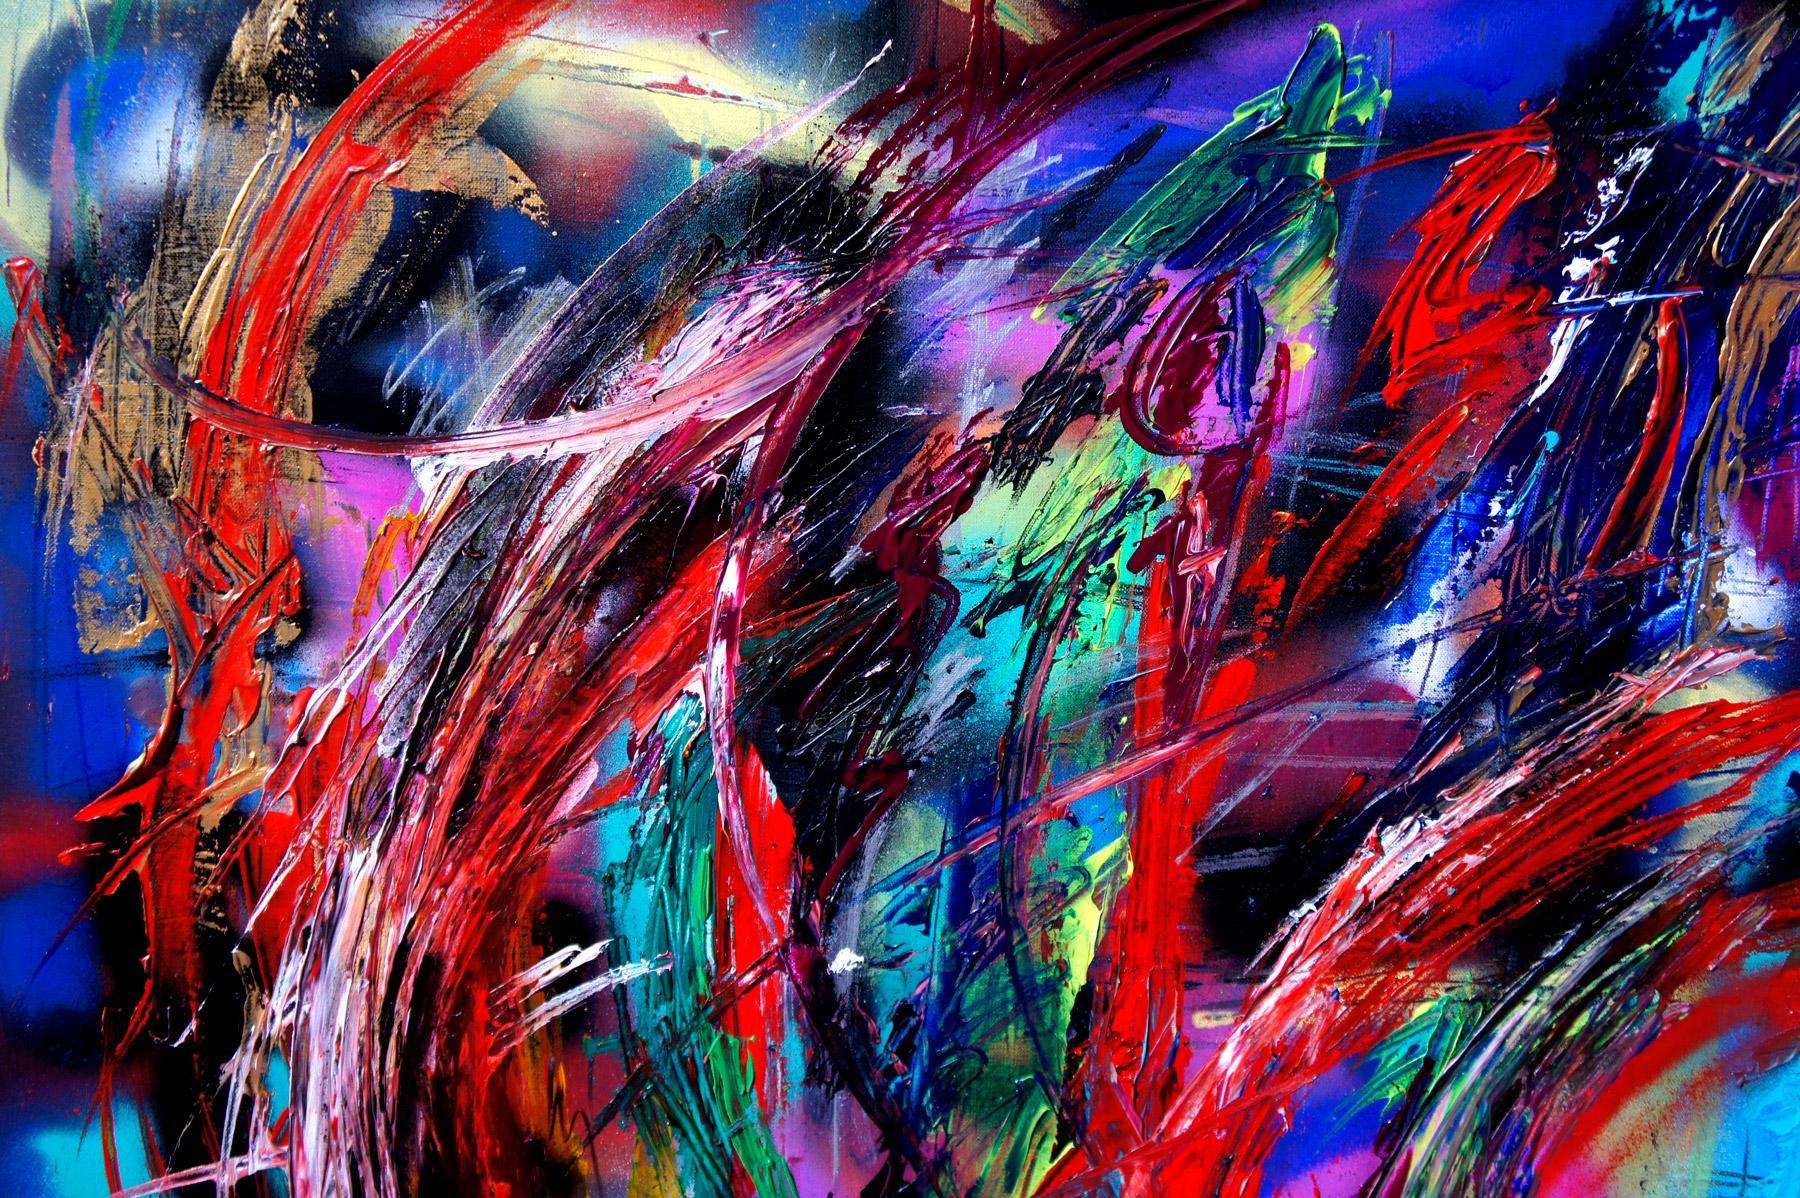 silva-usta-acrylic-rubis-1